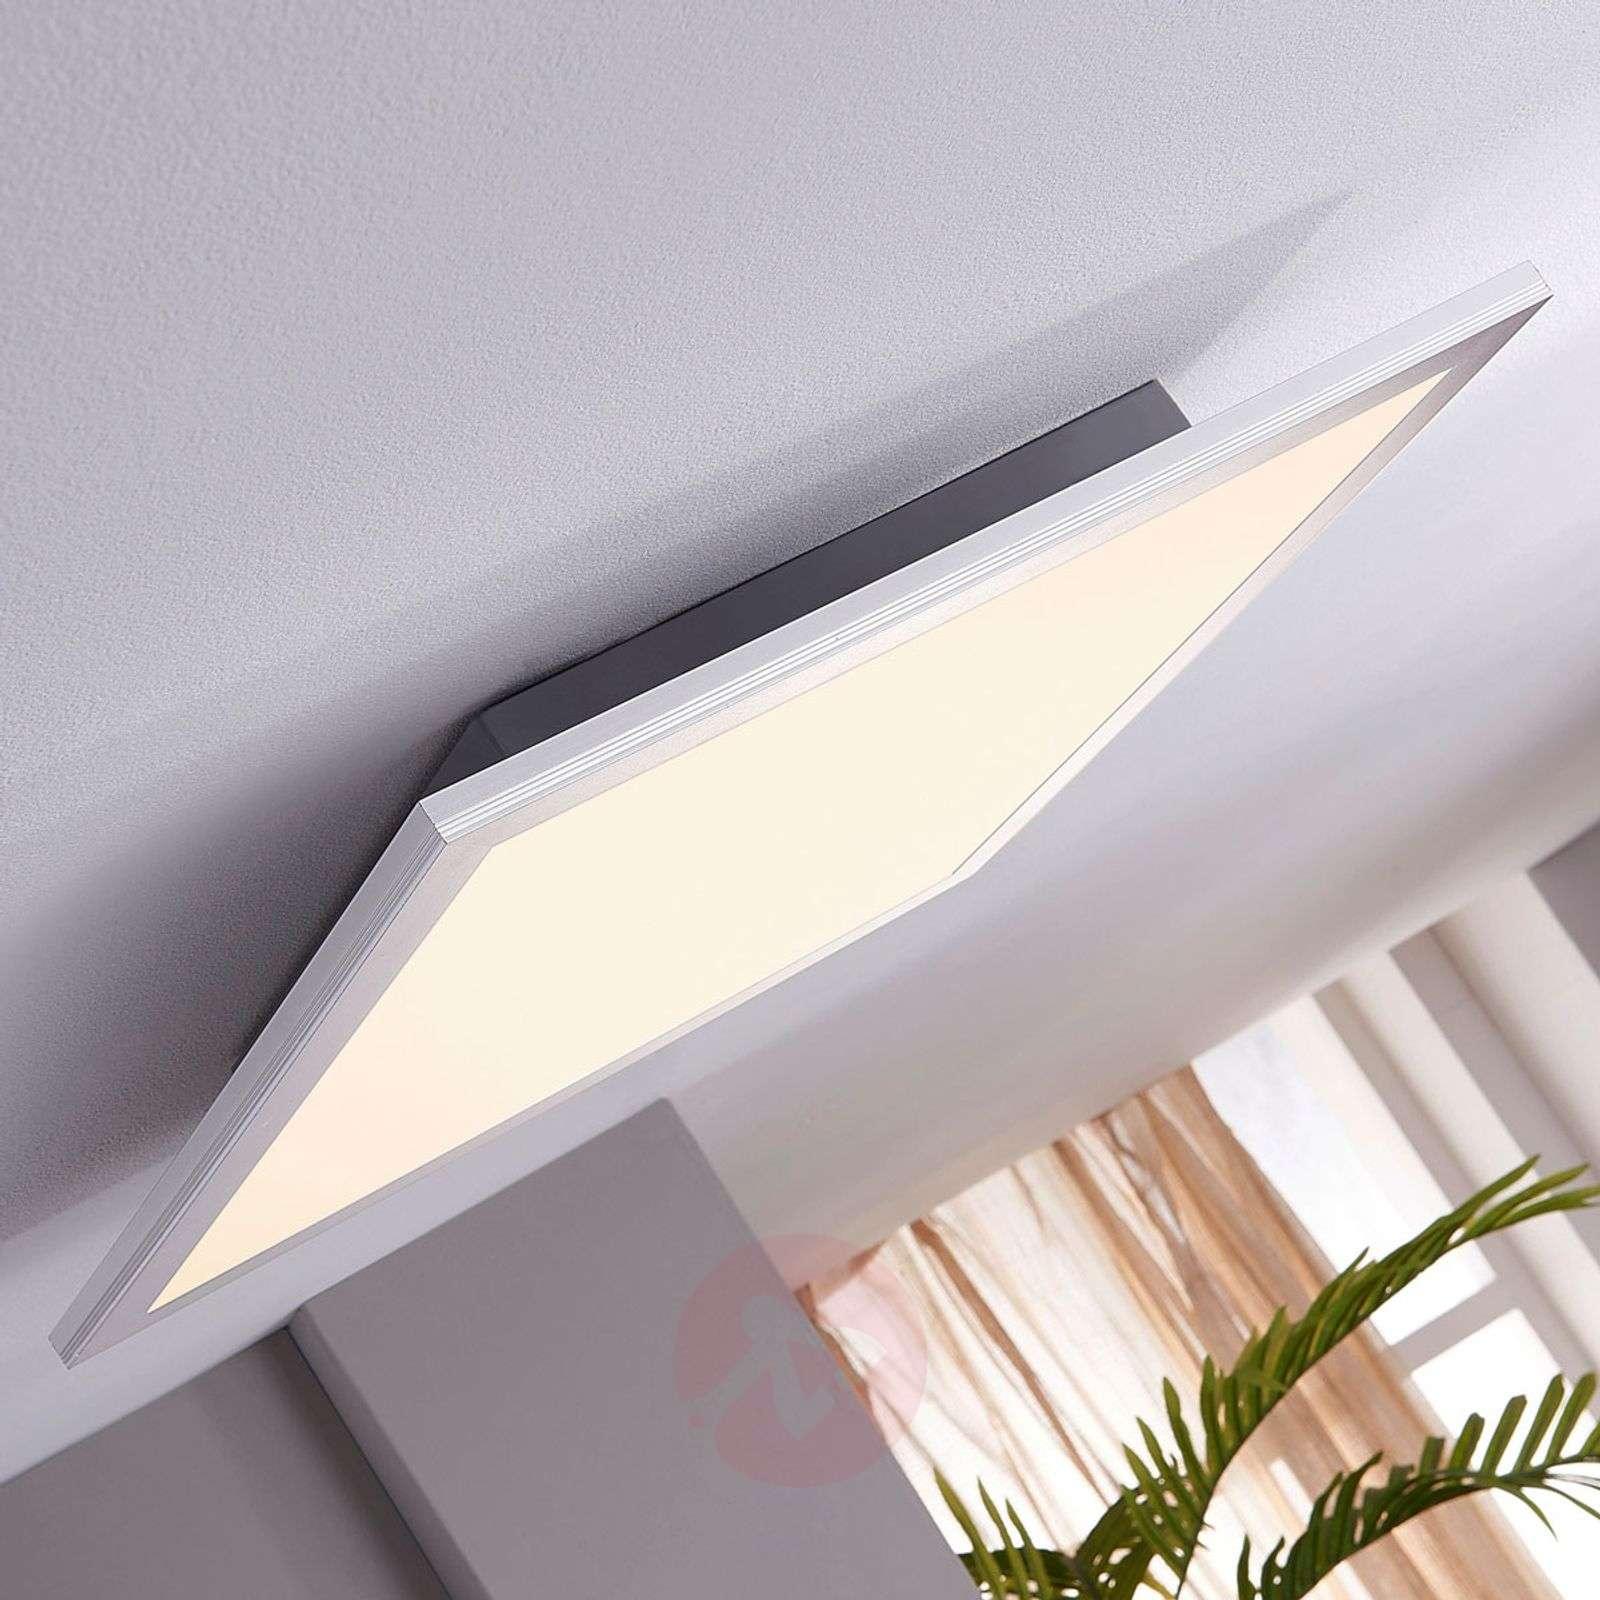 Square LED ceiling light Liv, 28 W-9956001-01